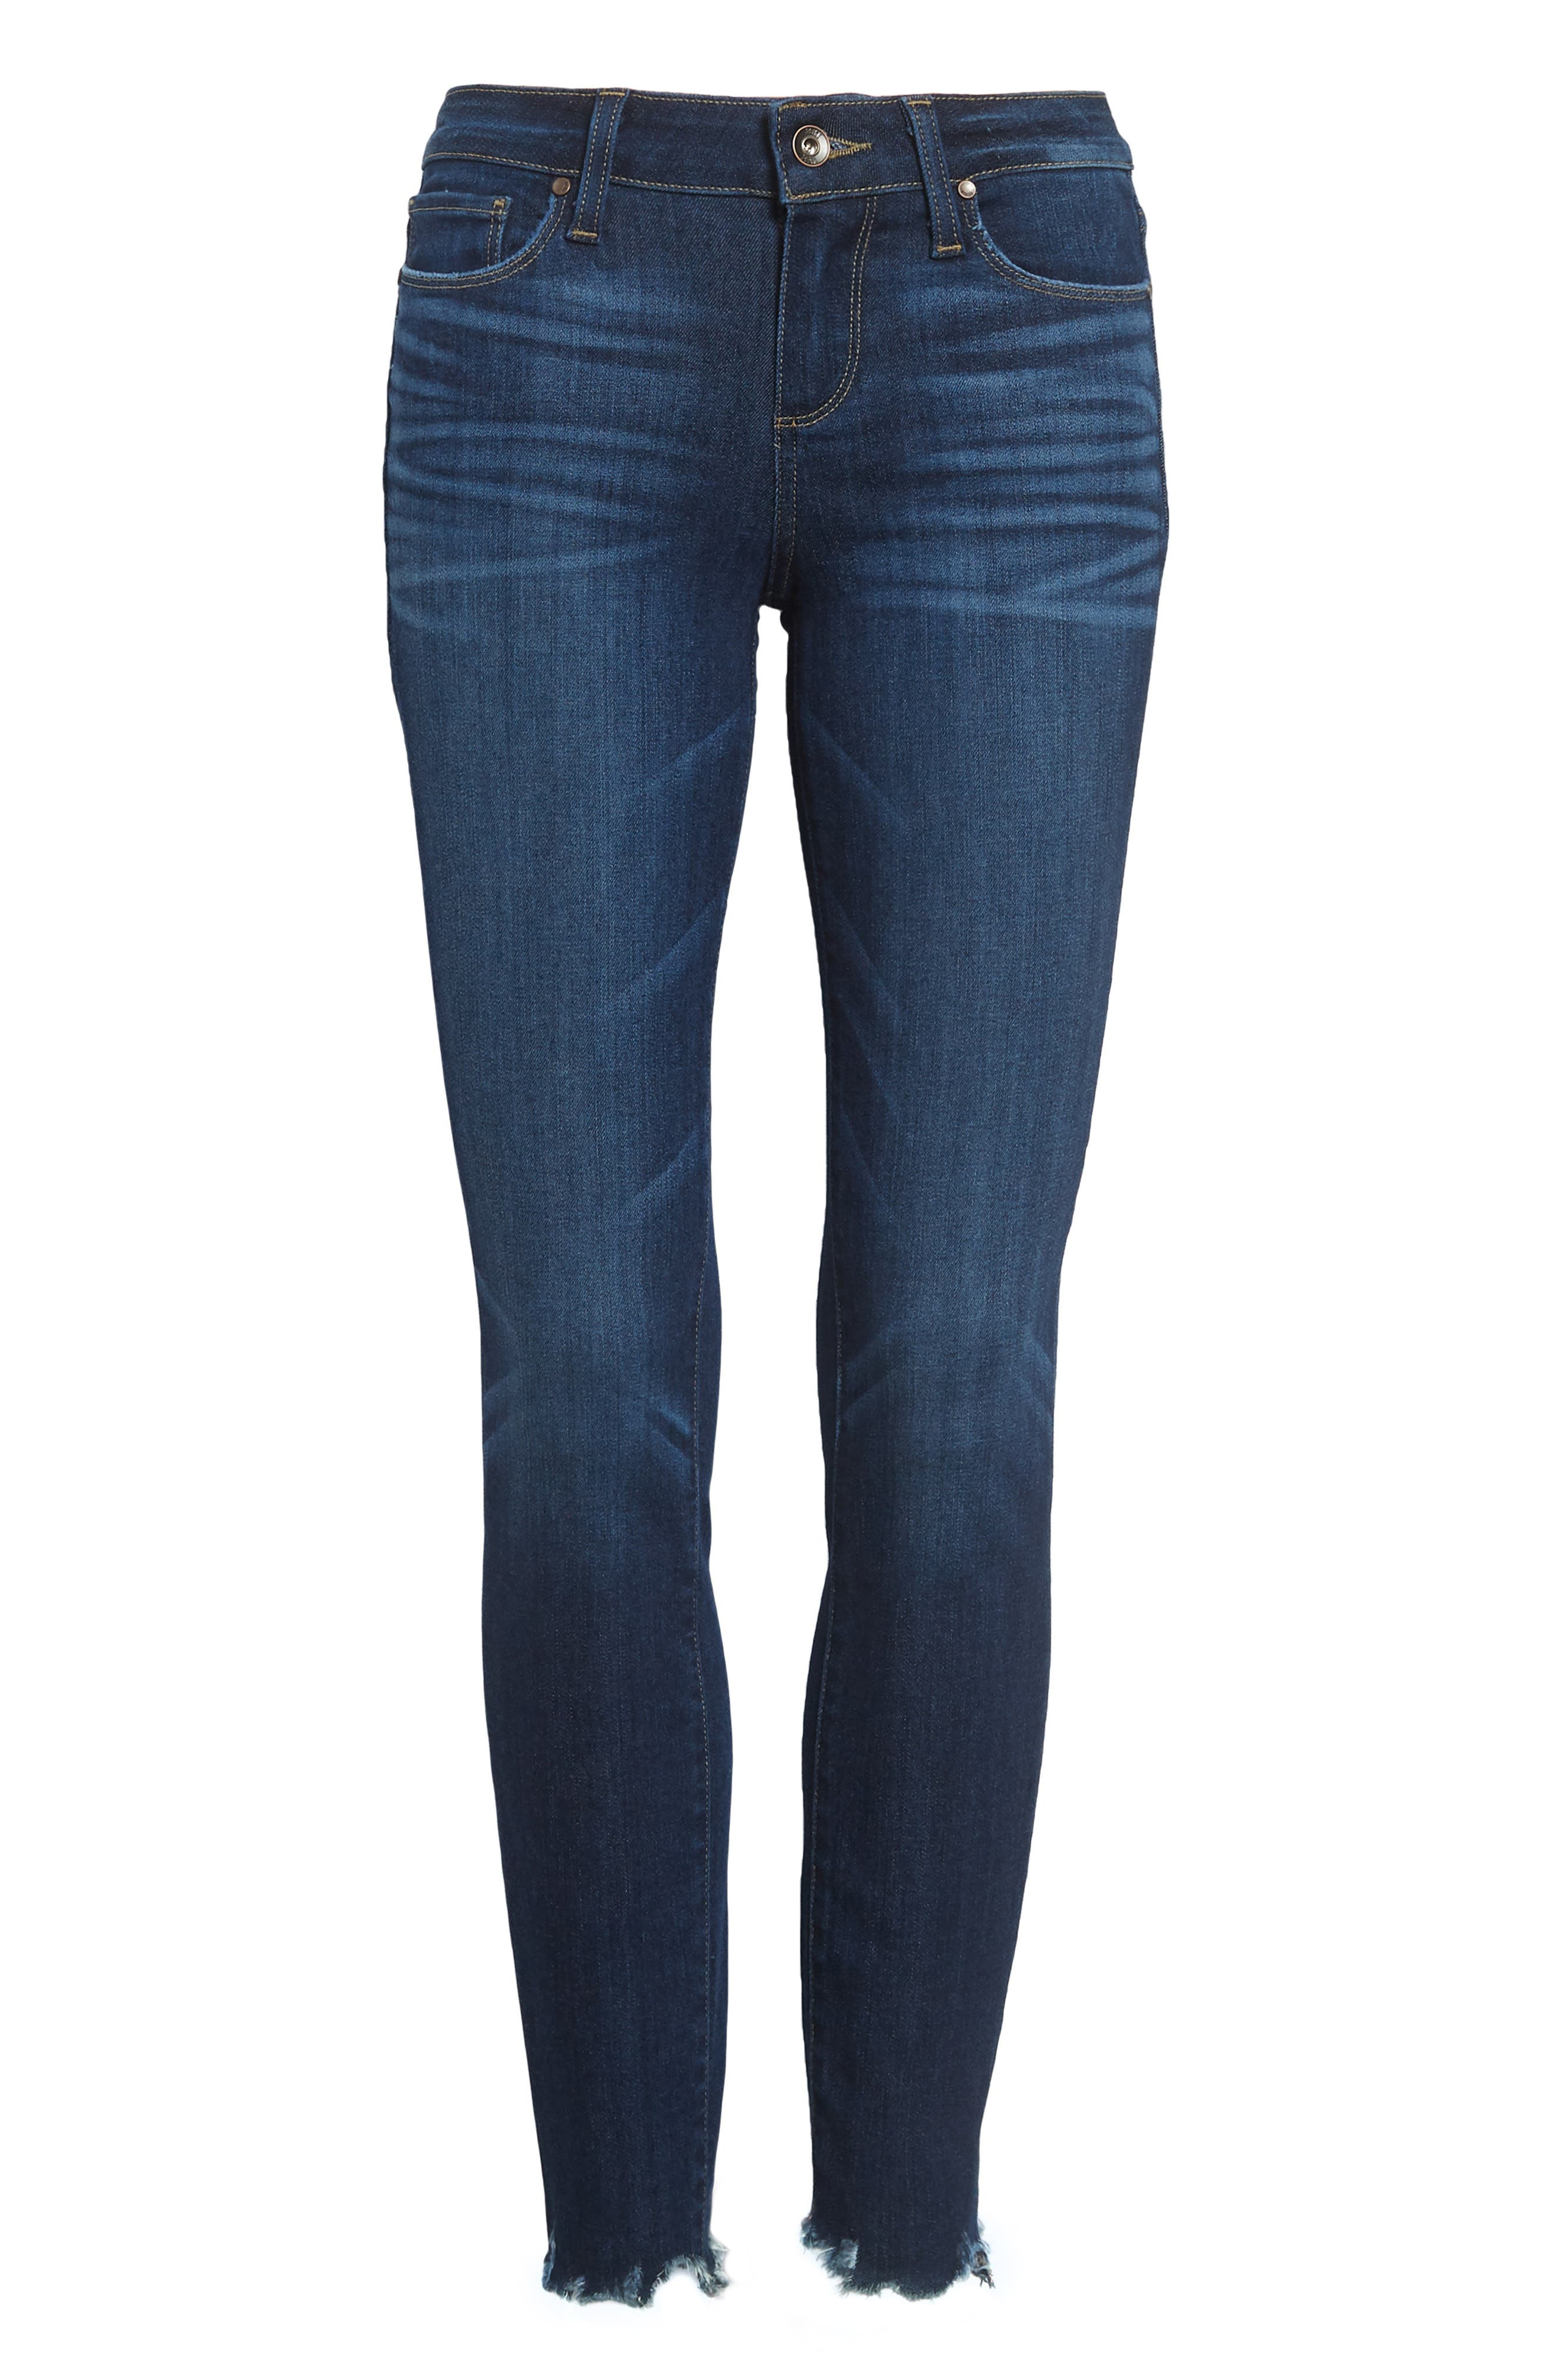 Verdugo Transcend Vintage Ankle Skinny Jeans,                             Alternate thumbnail 5, color,                             400